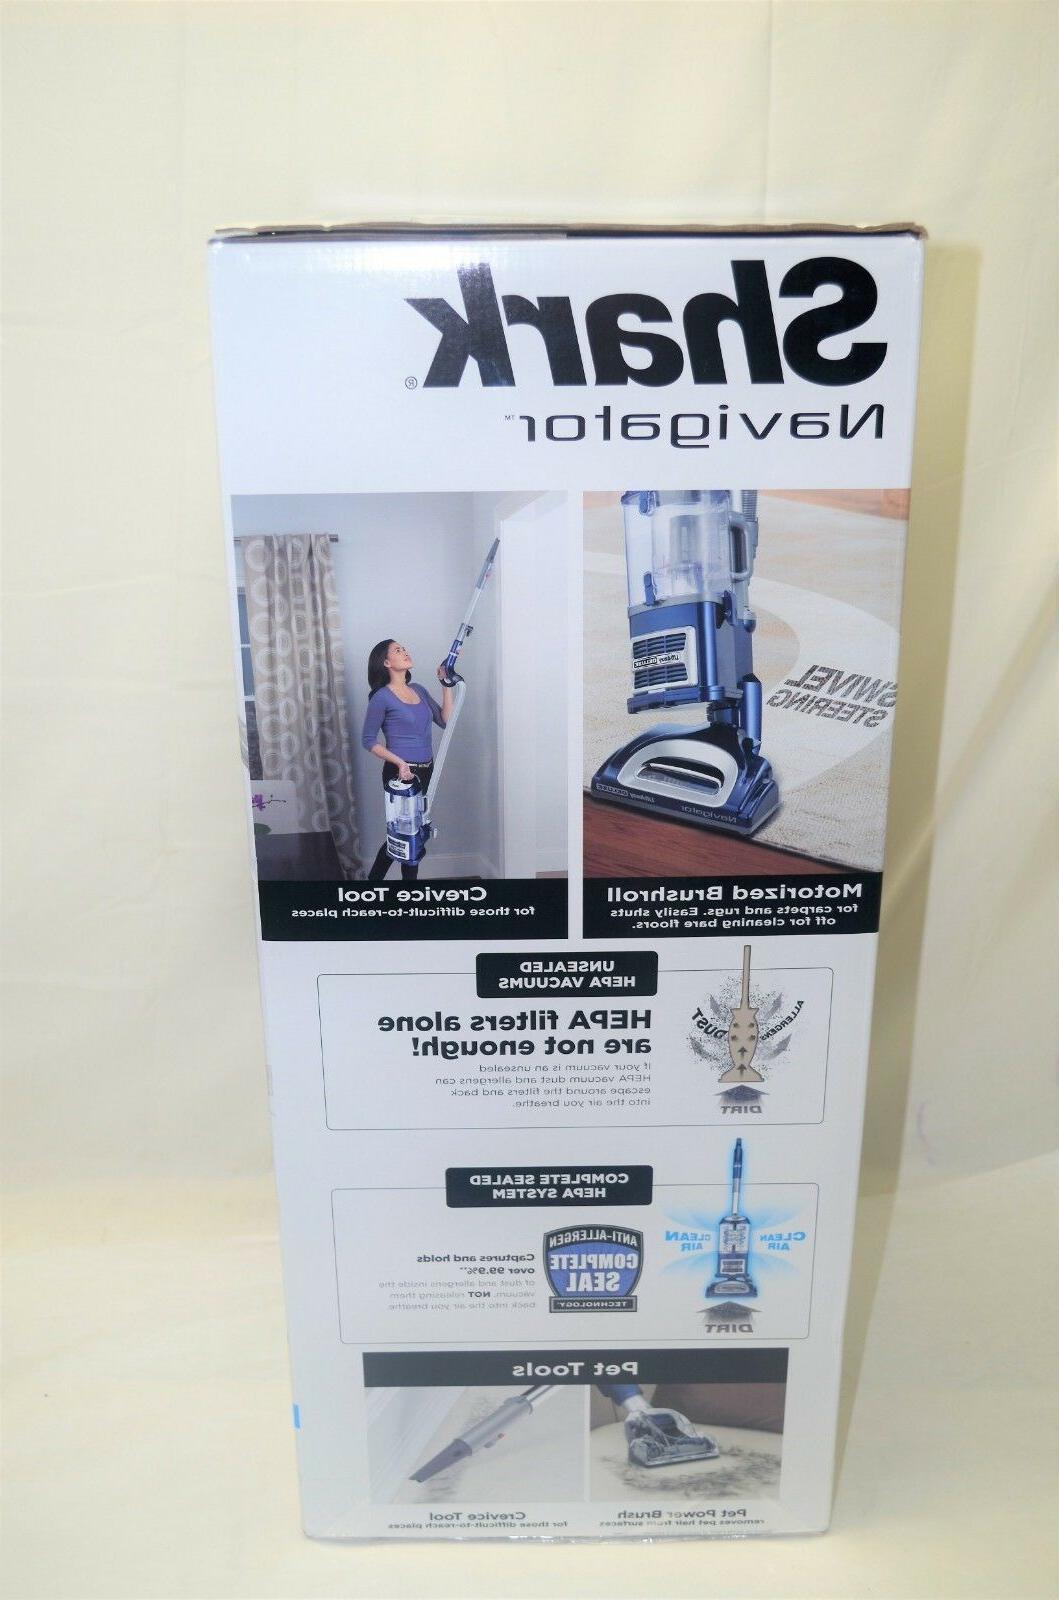 SharkNinja Lift-Away Deluxe NV360 Upright Vacuum, Blue